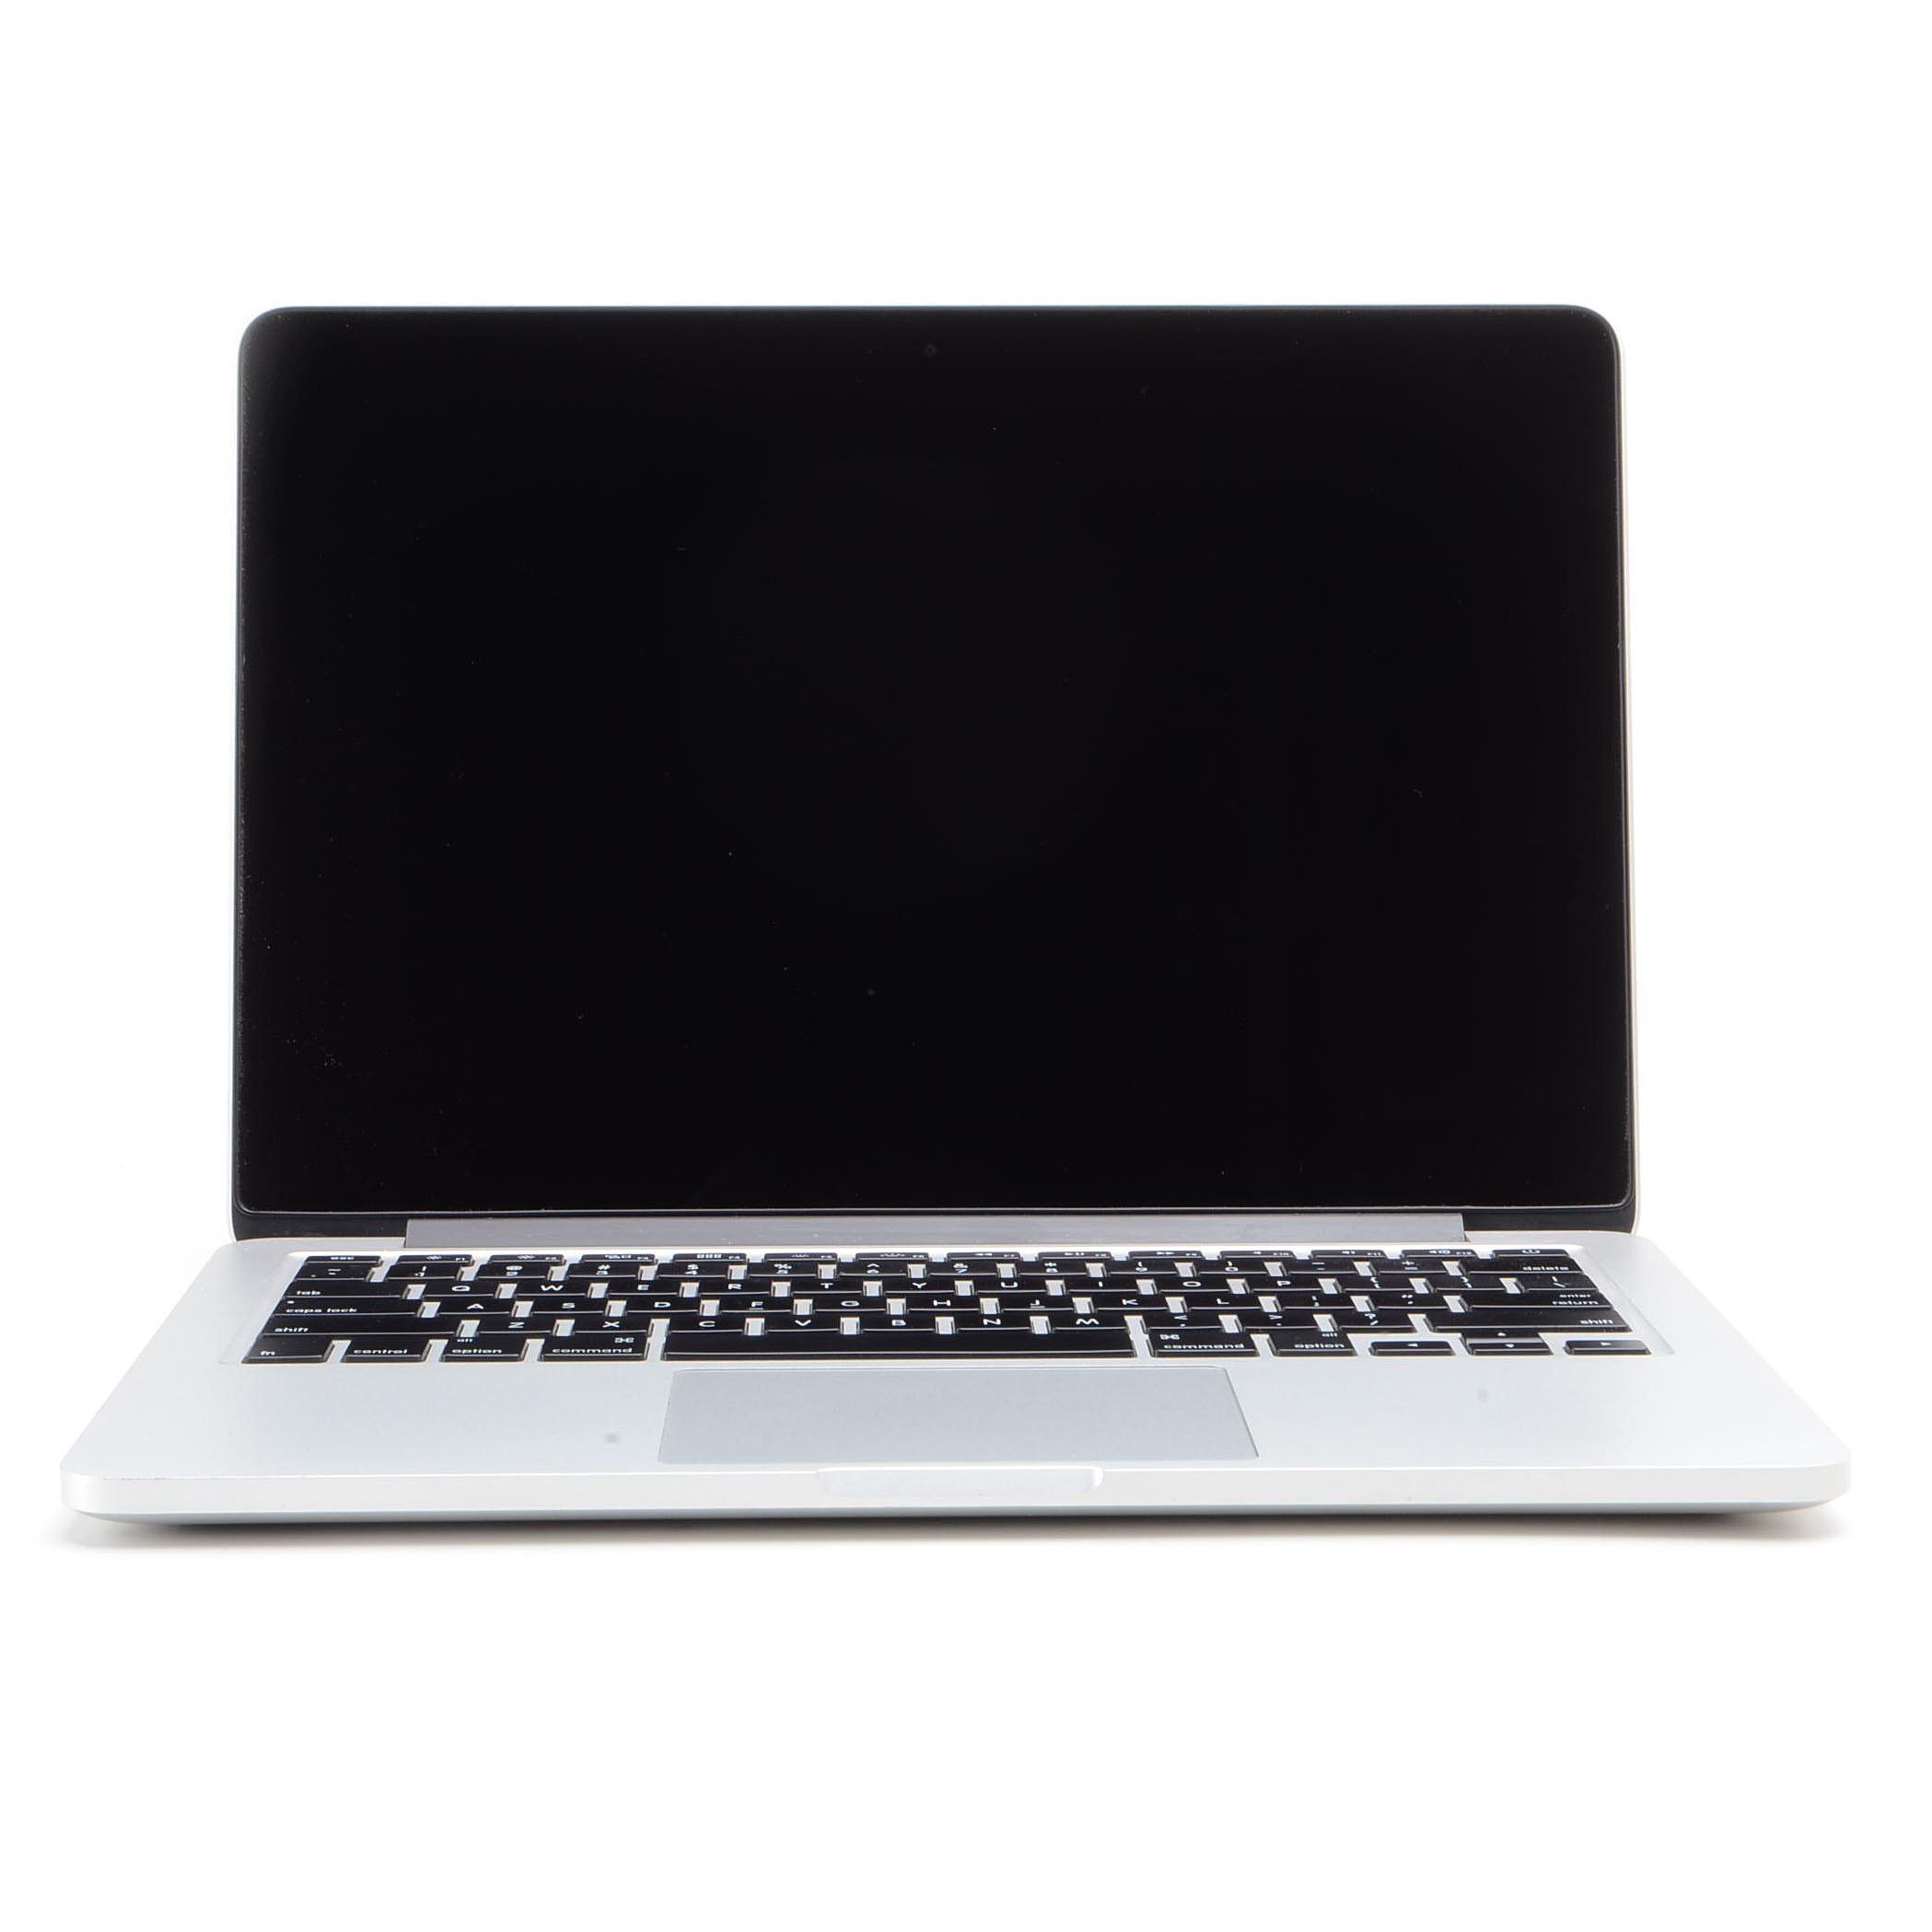 "13"" MacBook Pro Retina Laptop"